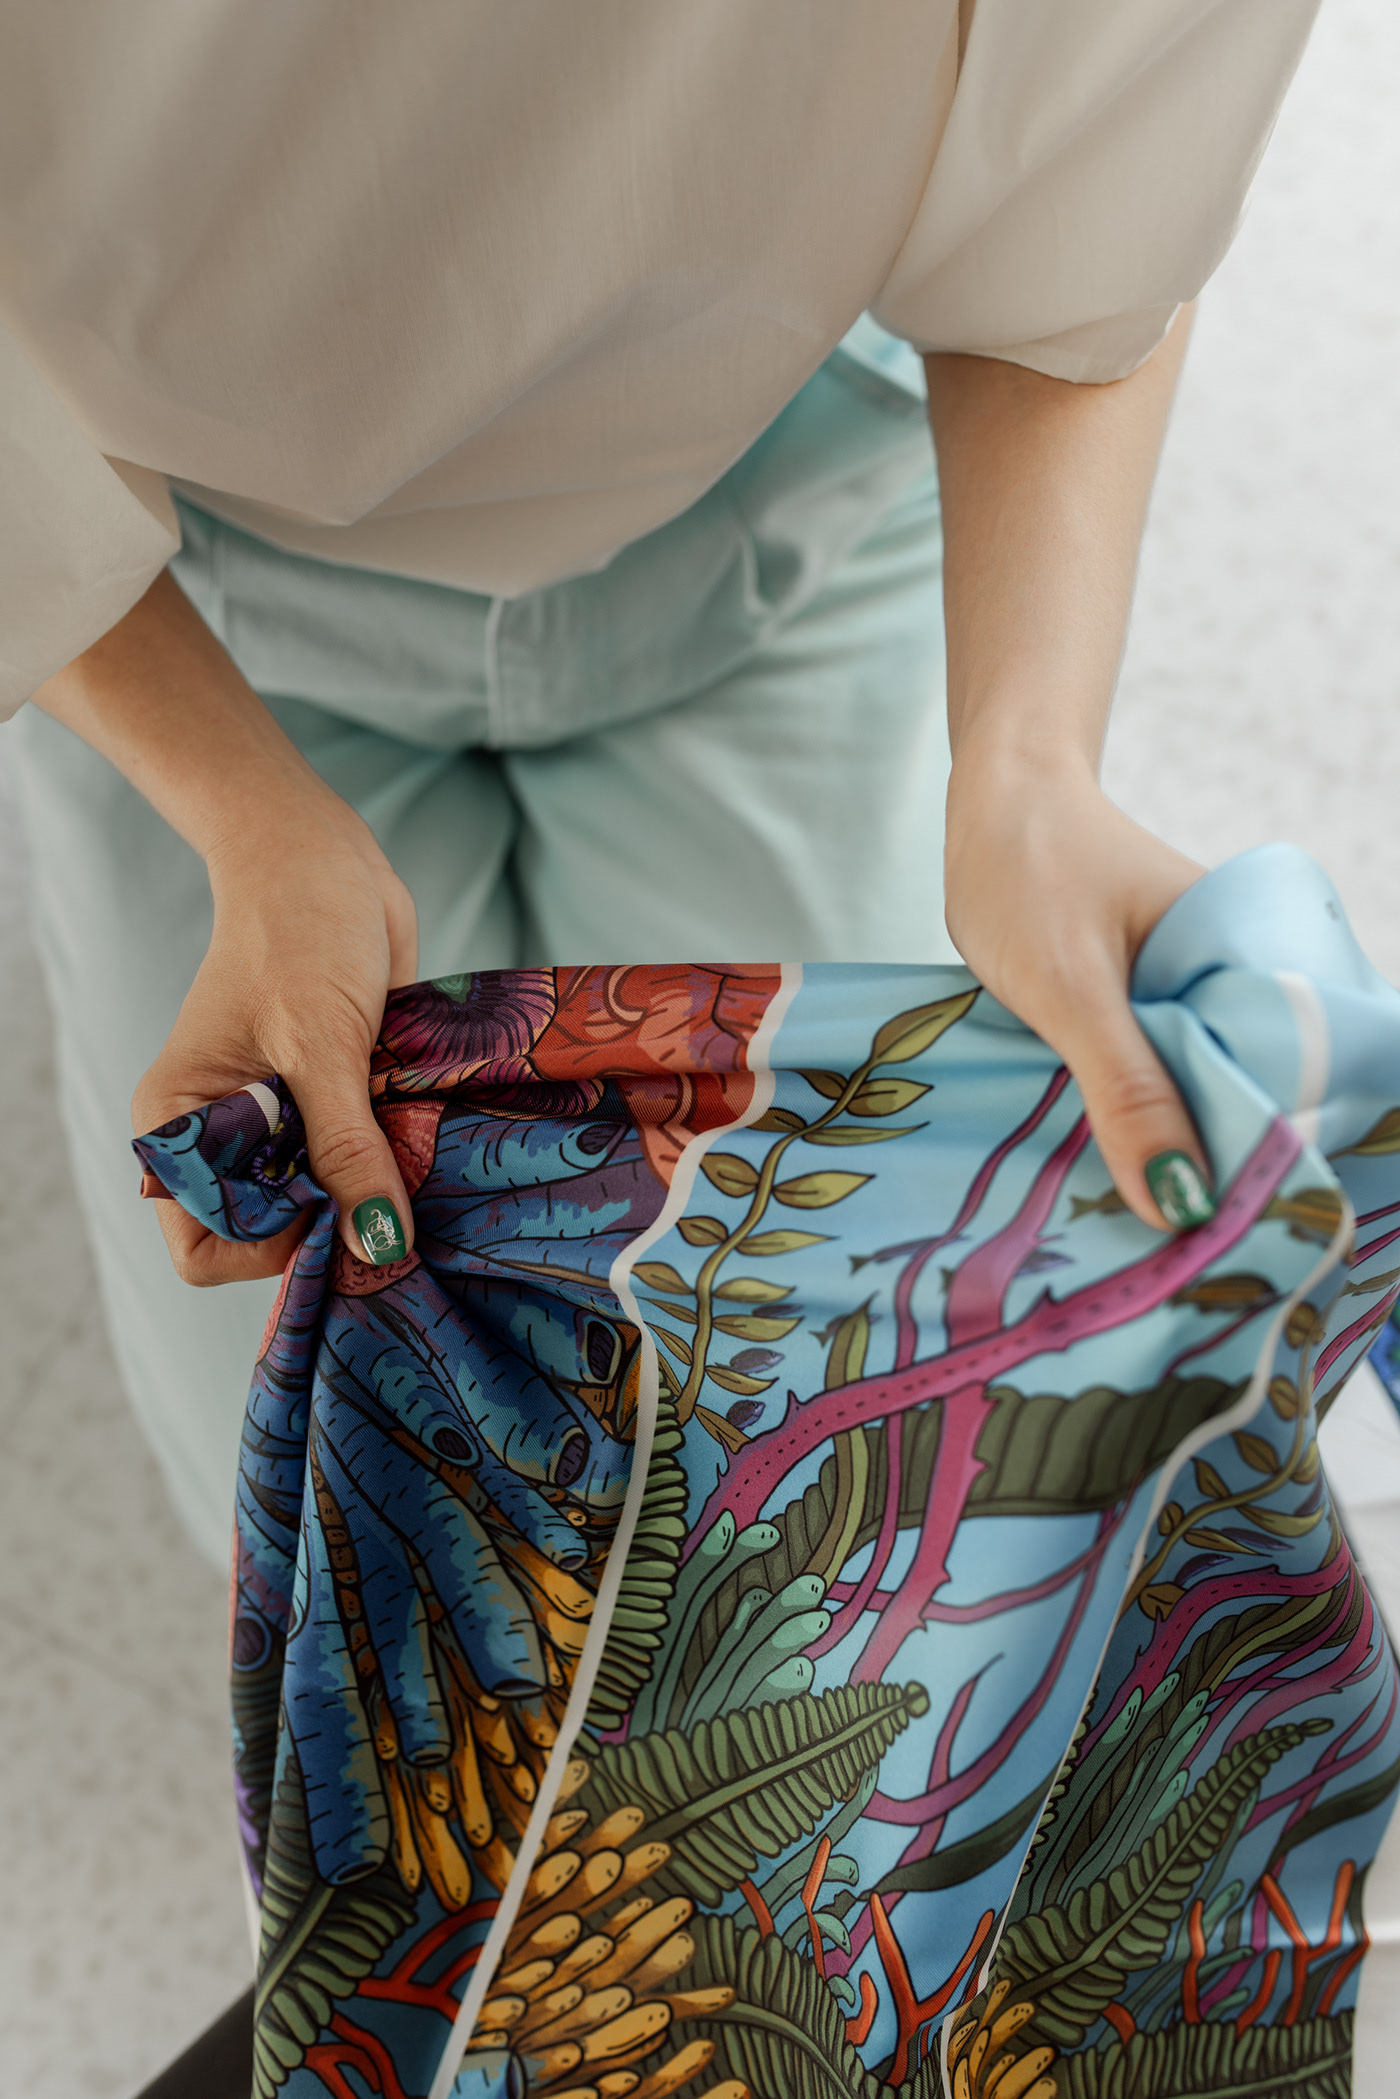 Lookbook for Silk Says